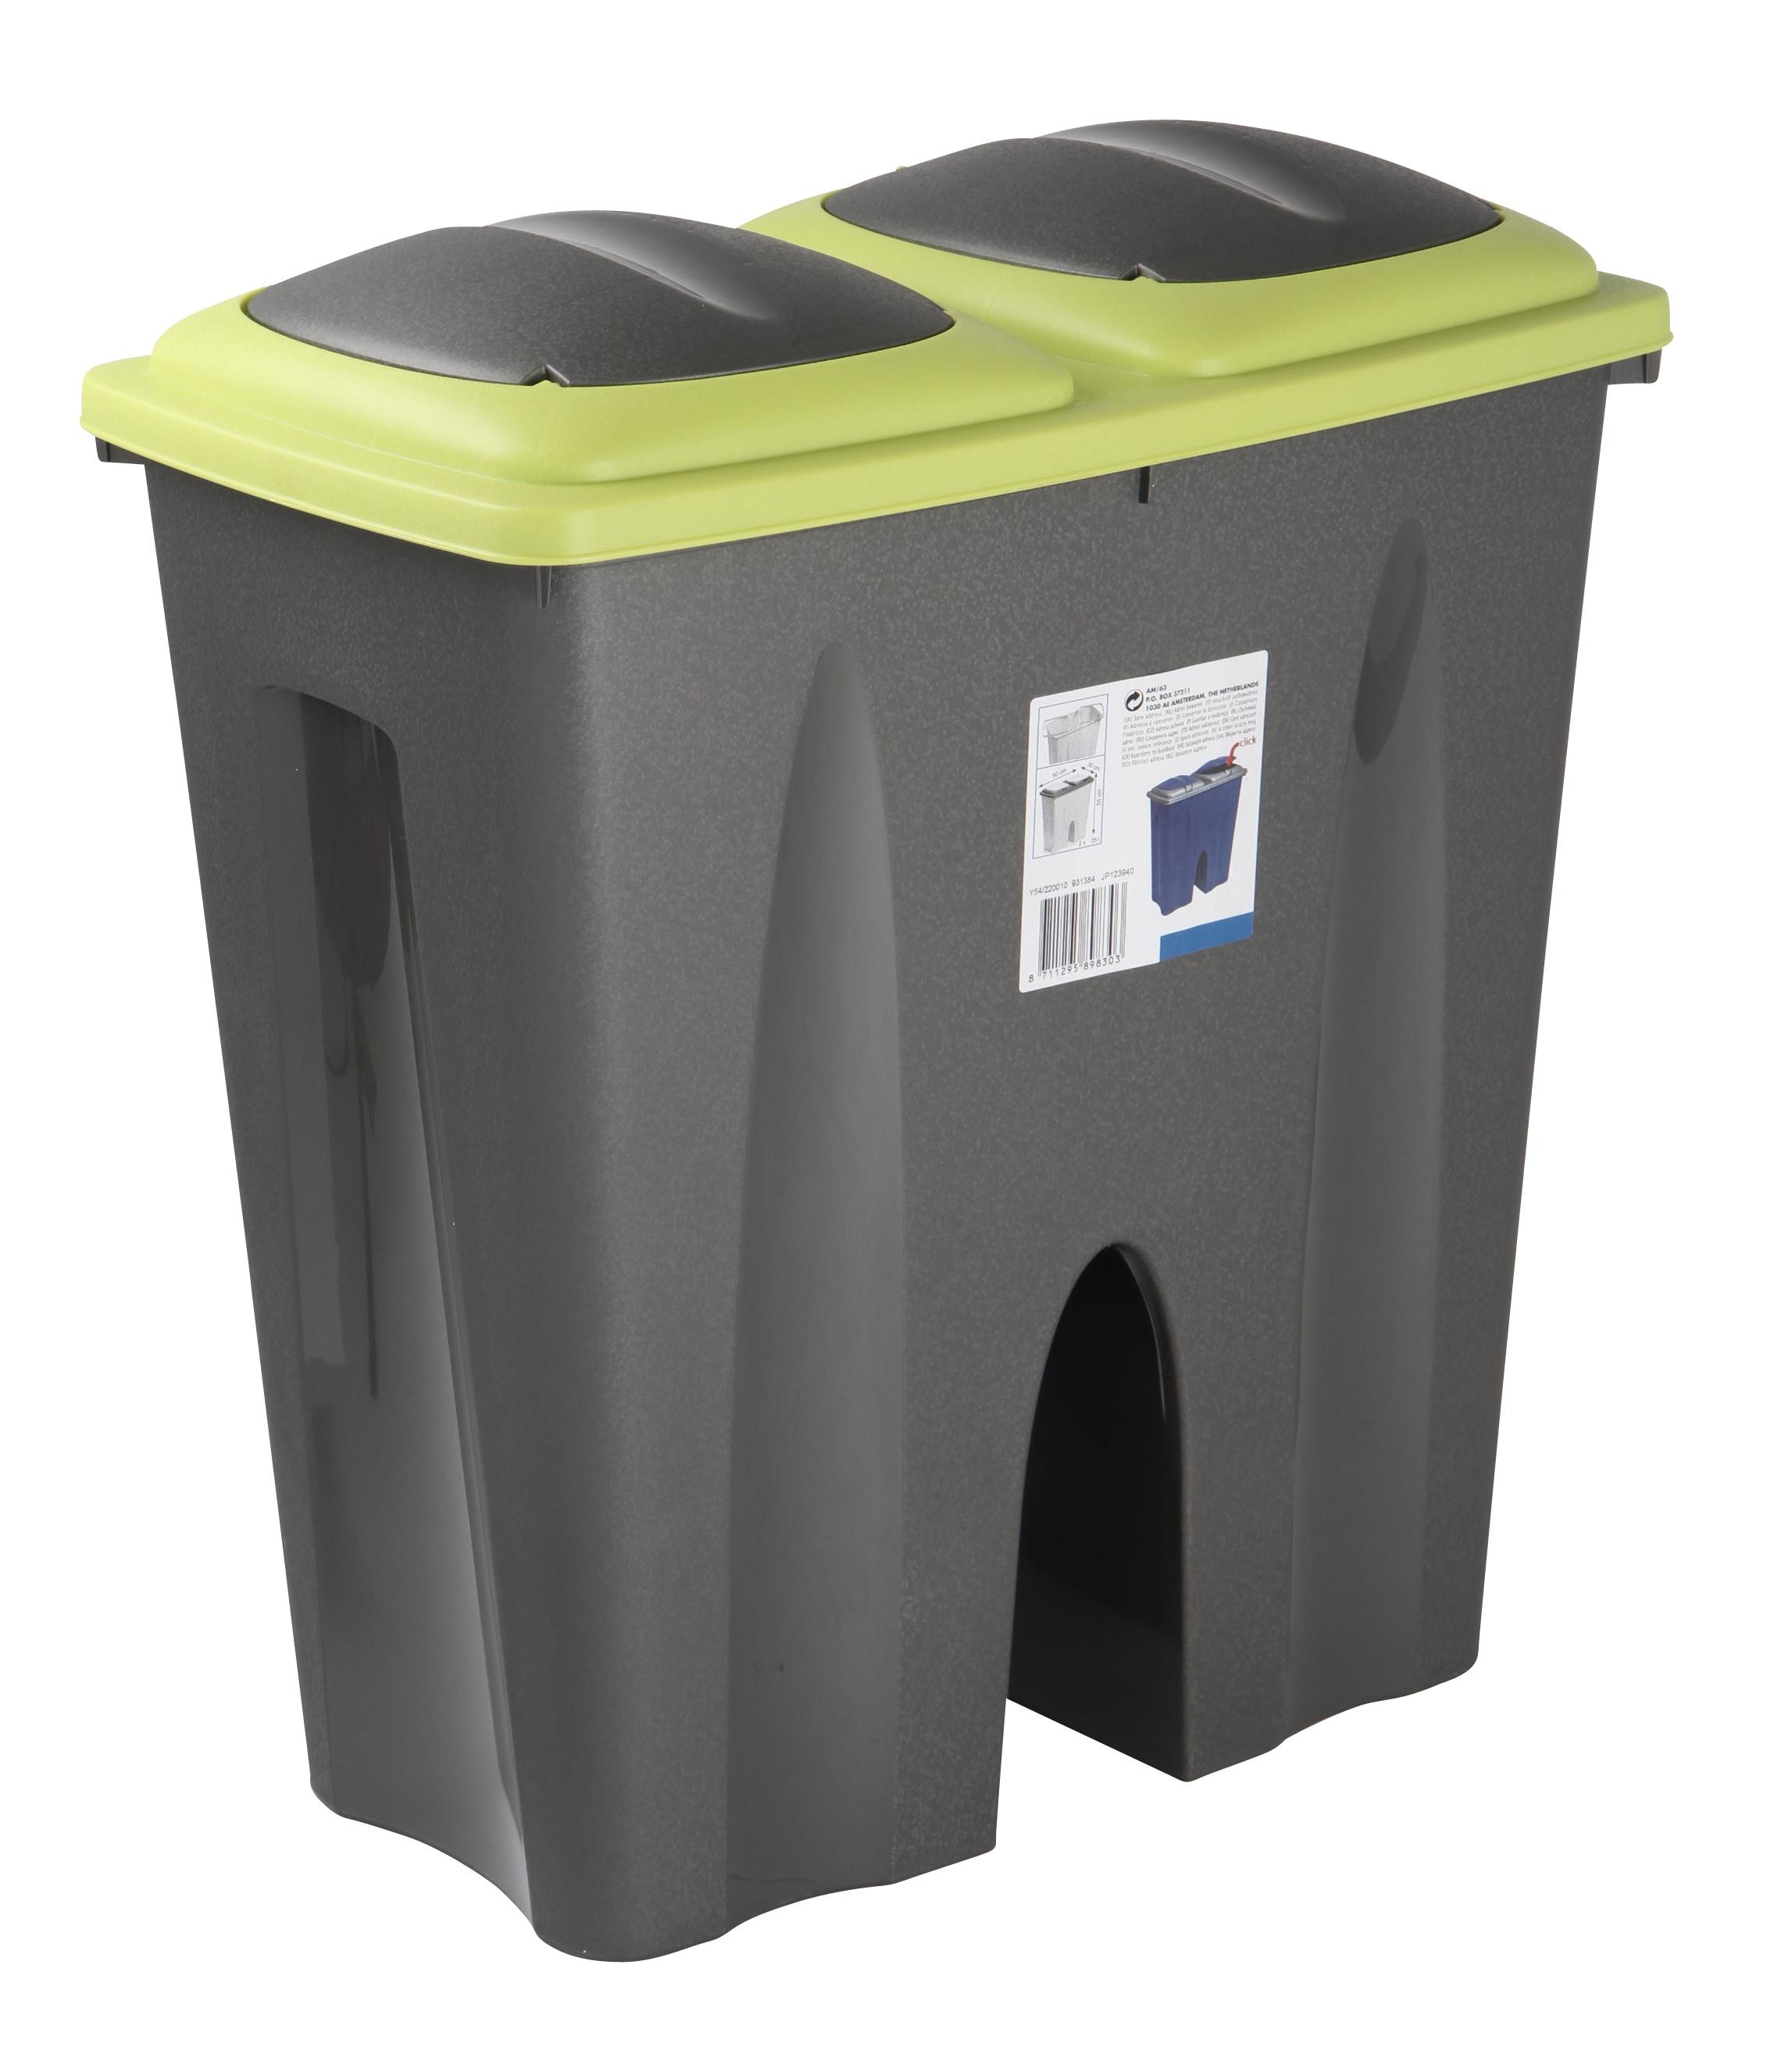 Double Recycling Waste Bin Duo Rubbish Plastic Cardboard Disposal